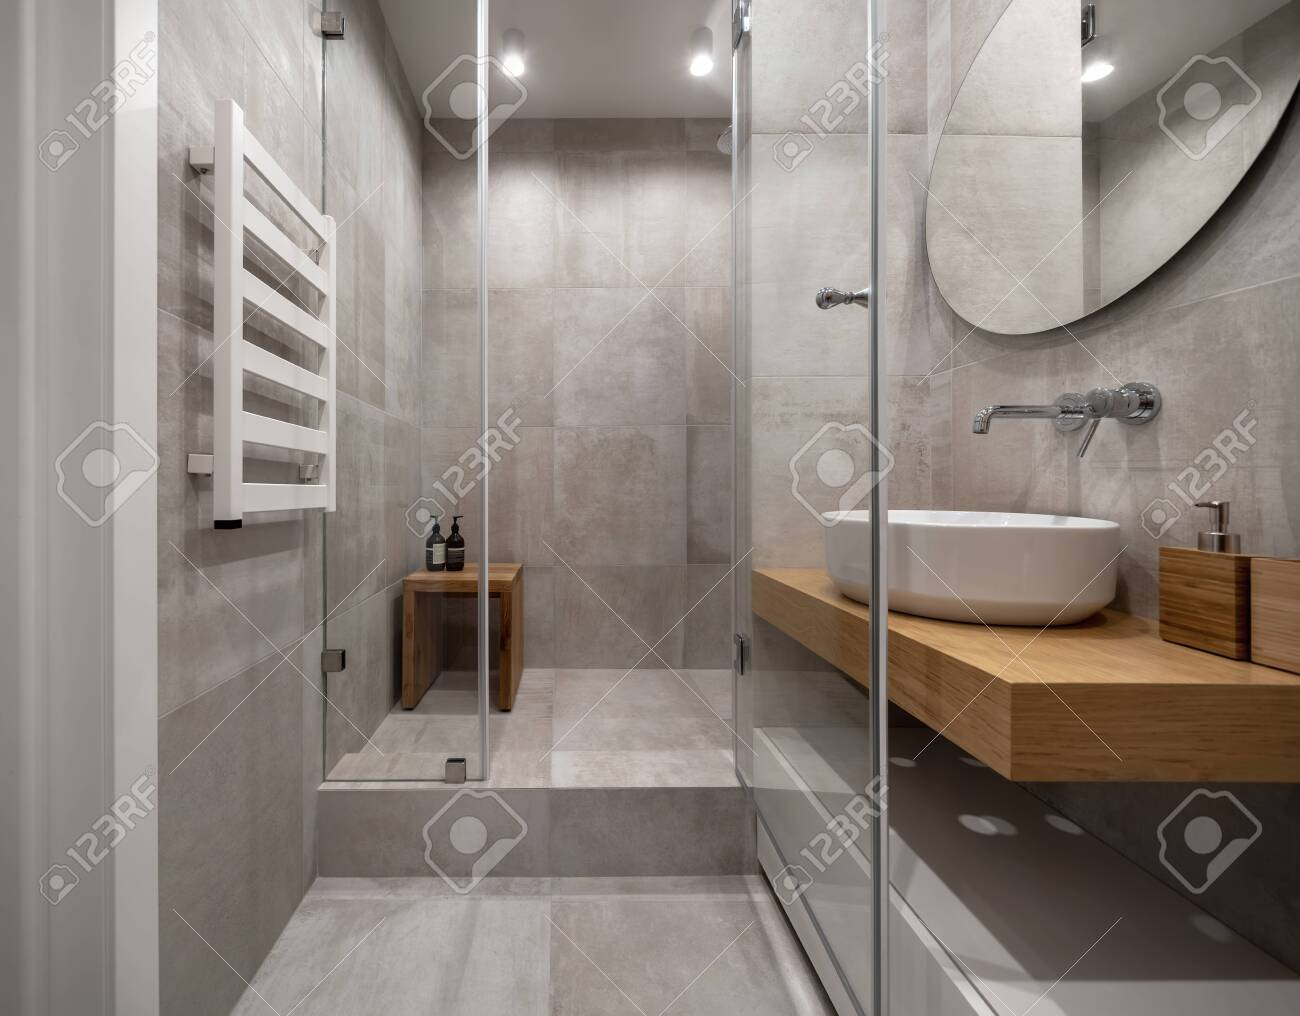 Stylish modern bathroom with light tiled walls and floor - 129141408